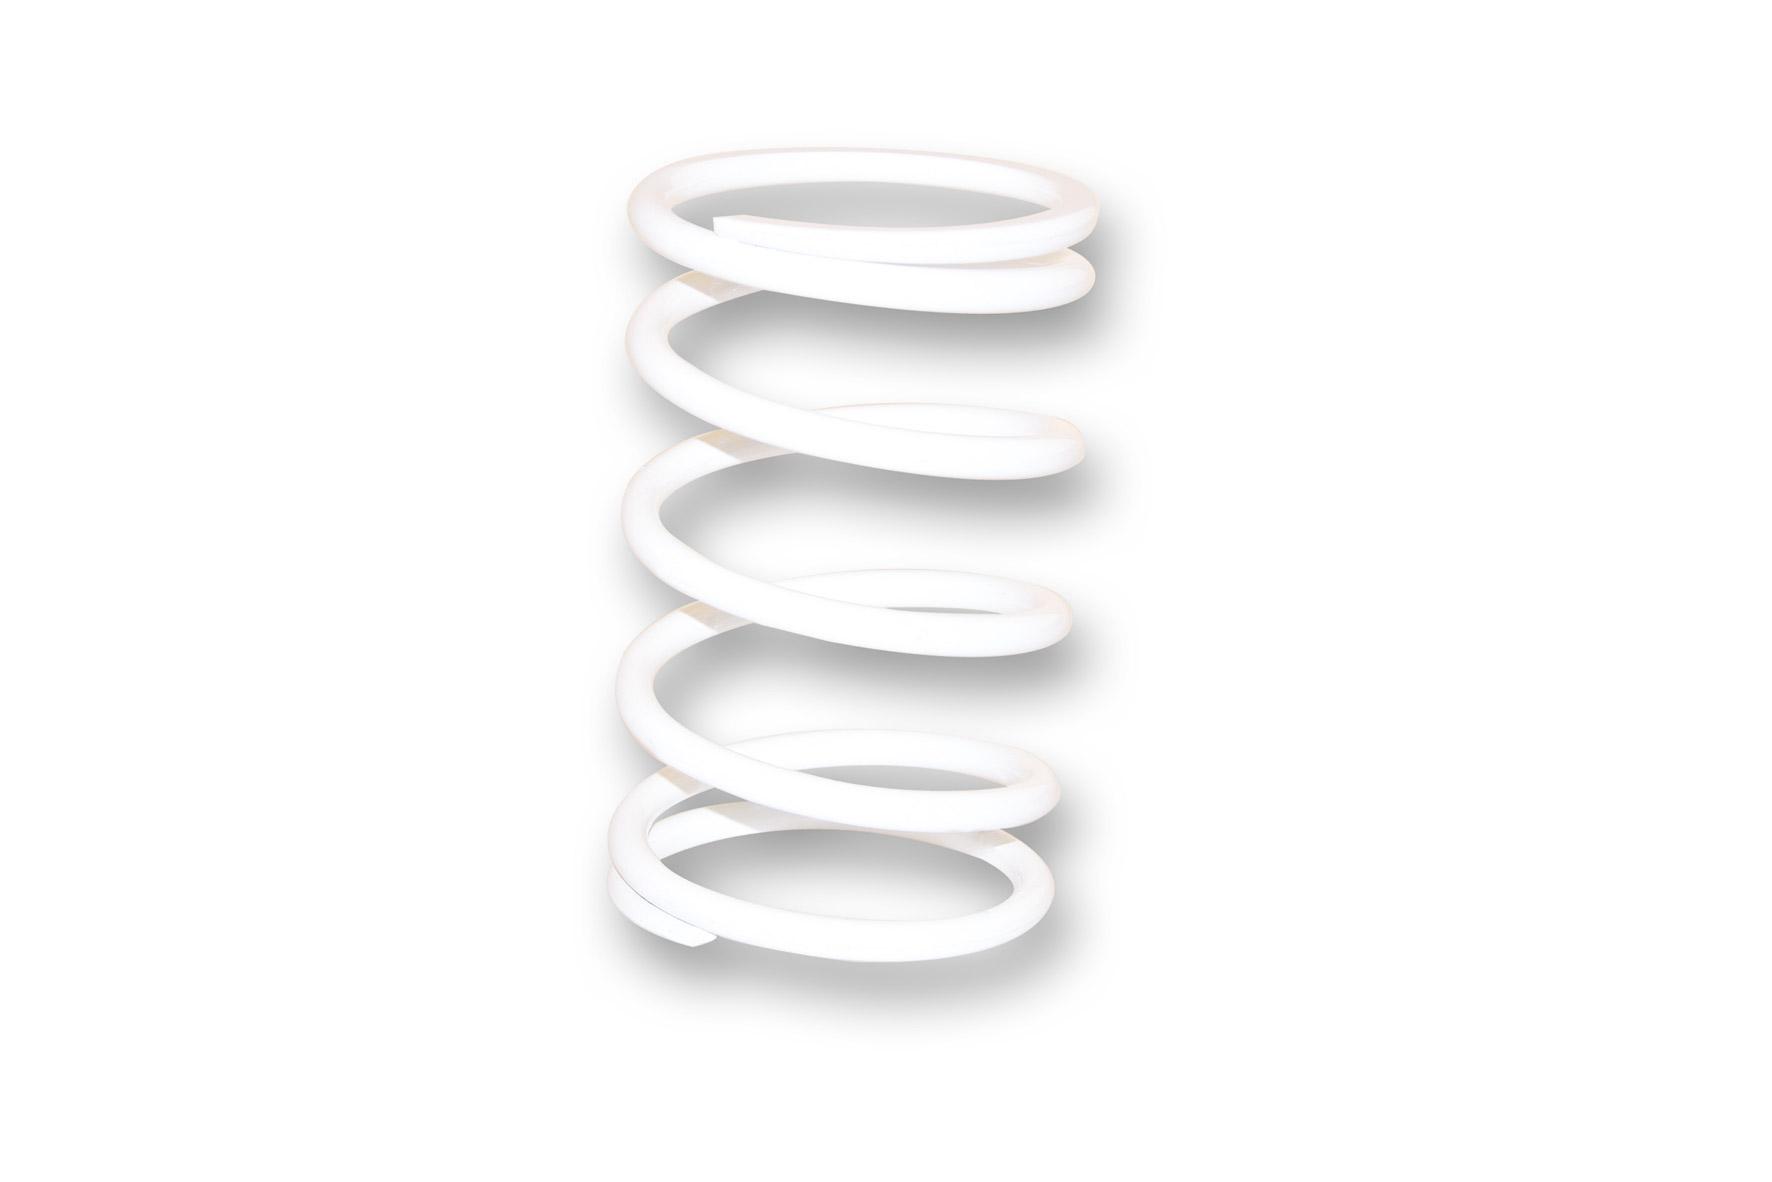 Molla di contrasto variatore bianca (Ø esterno 67,9x120 mm - Ø filo 5,4 mm - k 8,8)